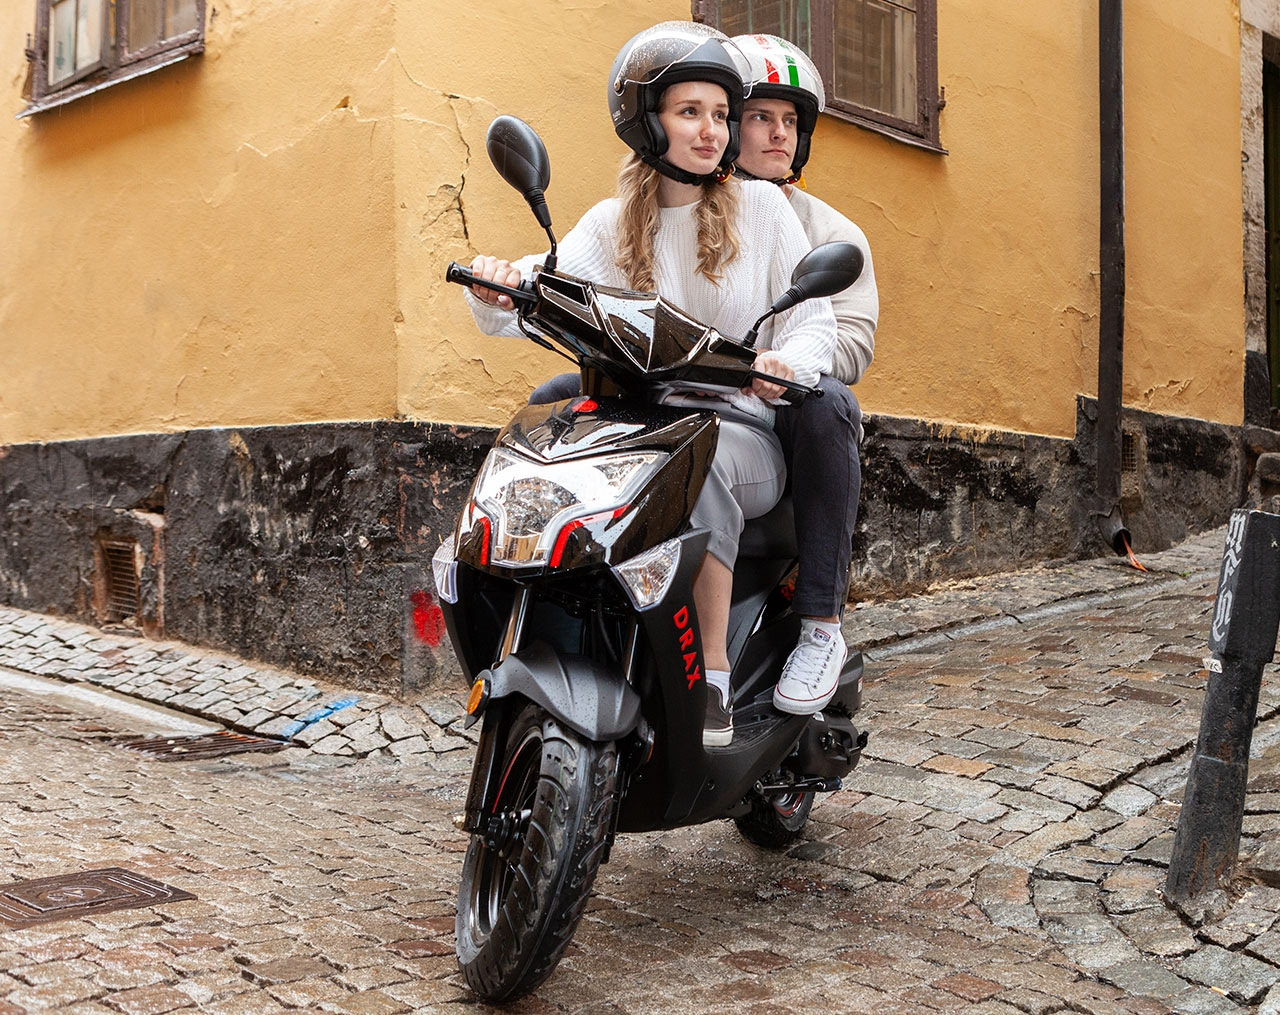 Drax Raw 45km/h Svart Euro5 Moped